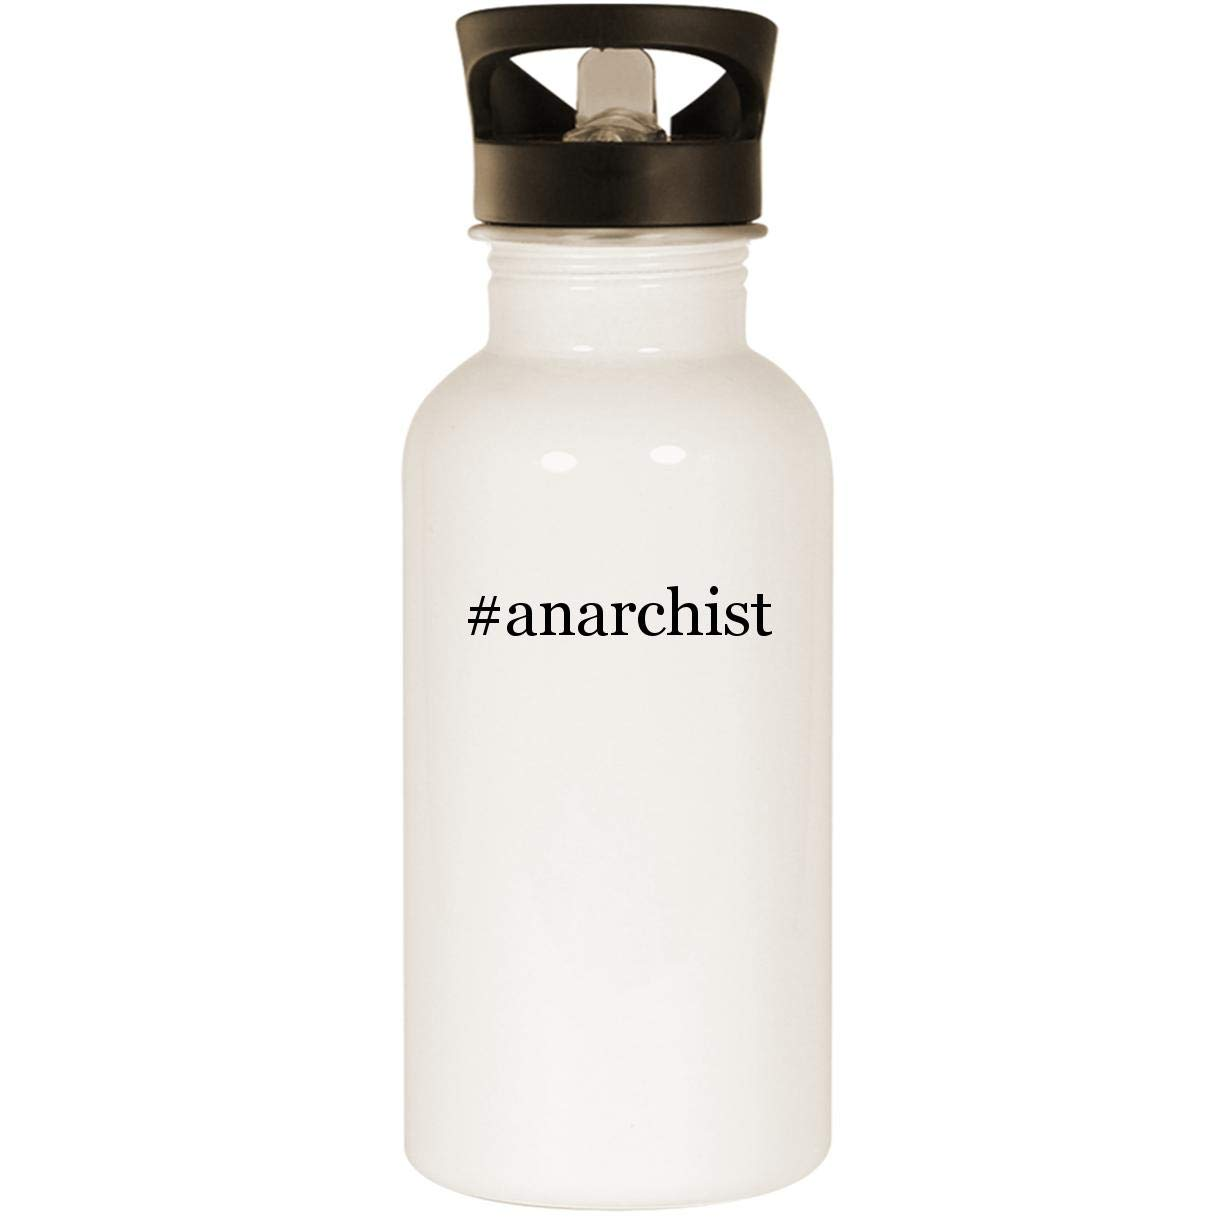 #anarchist - ステンレススチール 20オンス ロードレディウォーターボトル ホワイト US-C-07-18-02-002153-04-26-19-26 B07GN9XPDB ホワイト